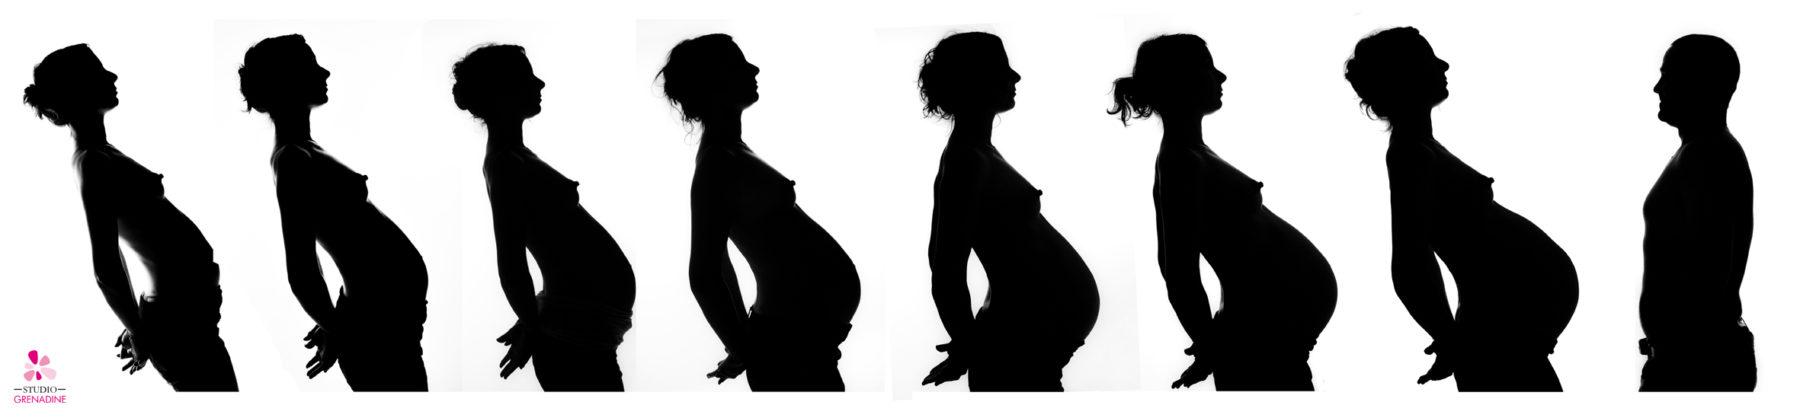 photographe de grossesse et femme enceinte 77. Black Bedroom Furniture Sets. Home Design Ideas